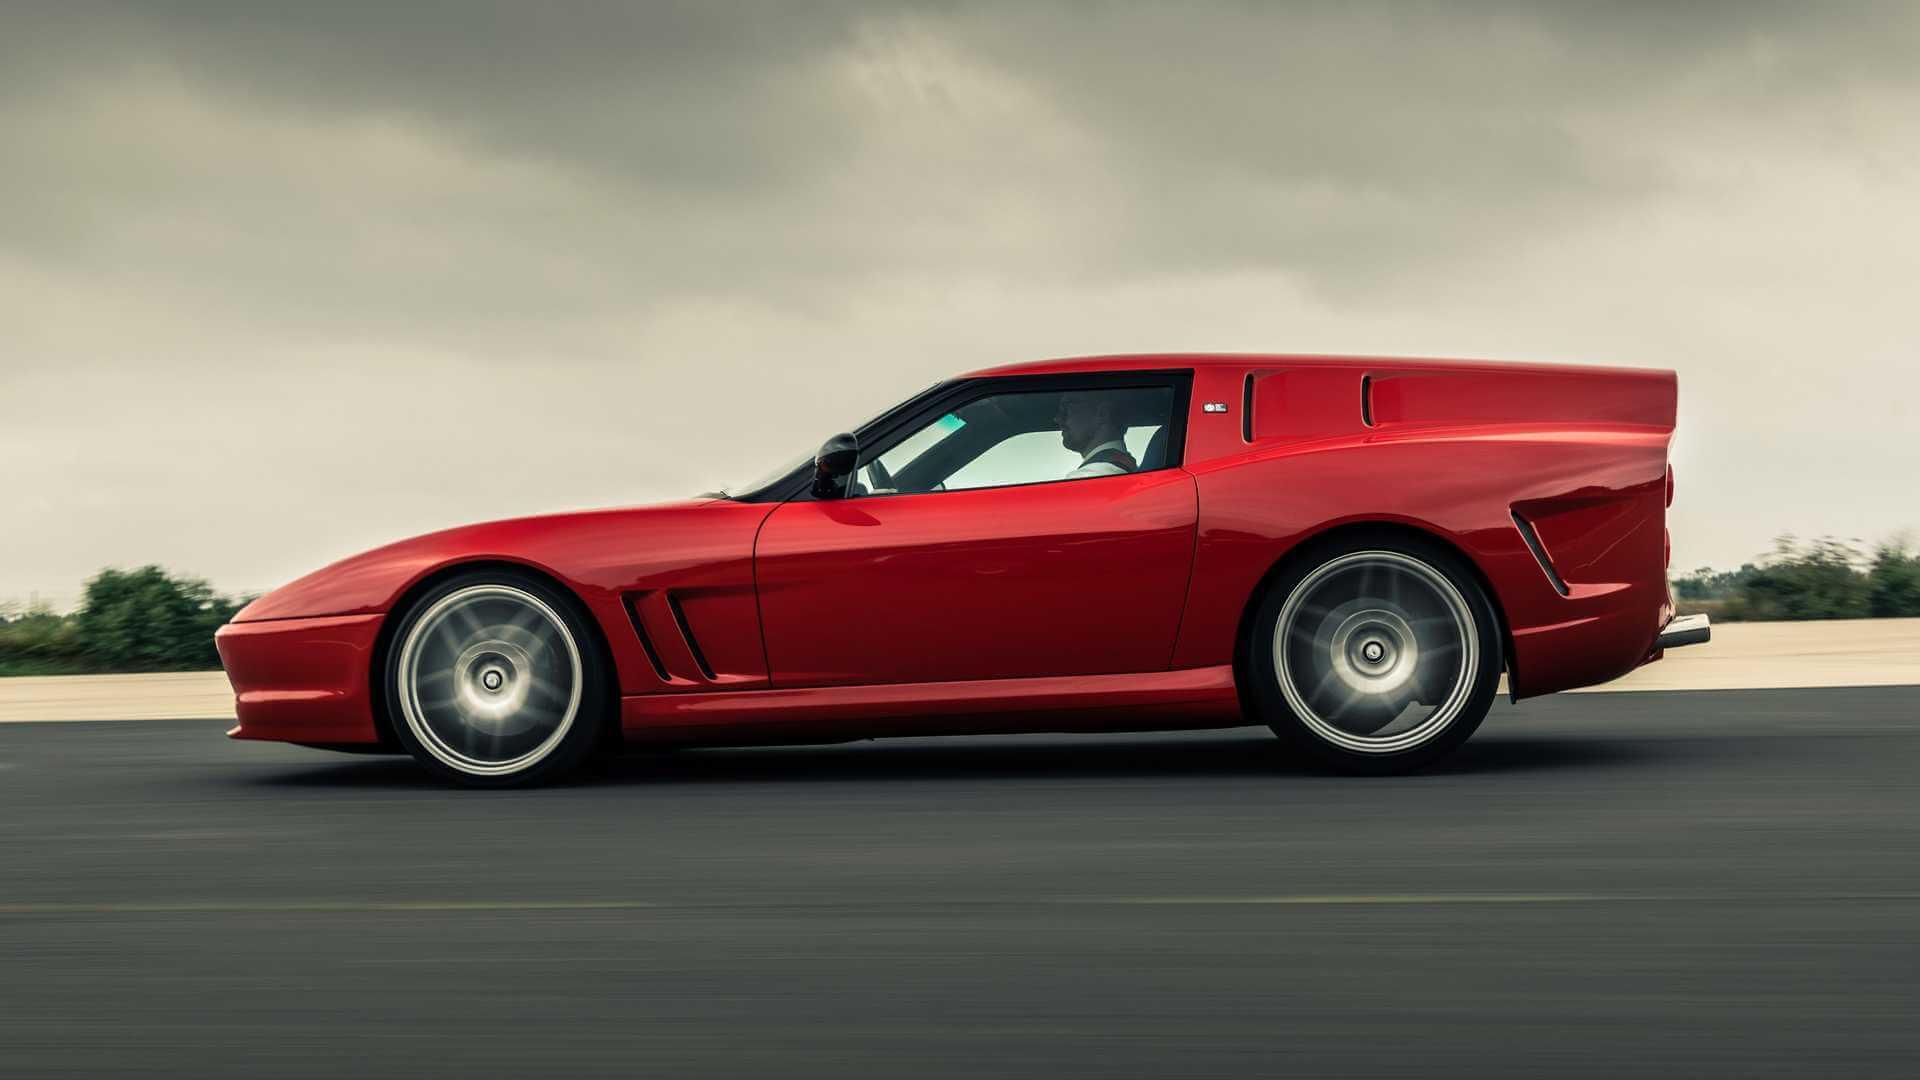 Ferrari 550 Maranello Breadvan